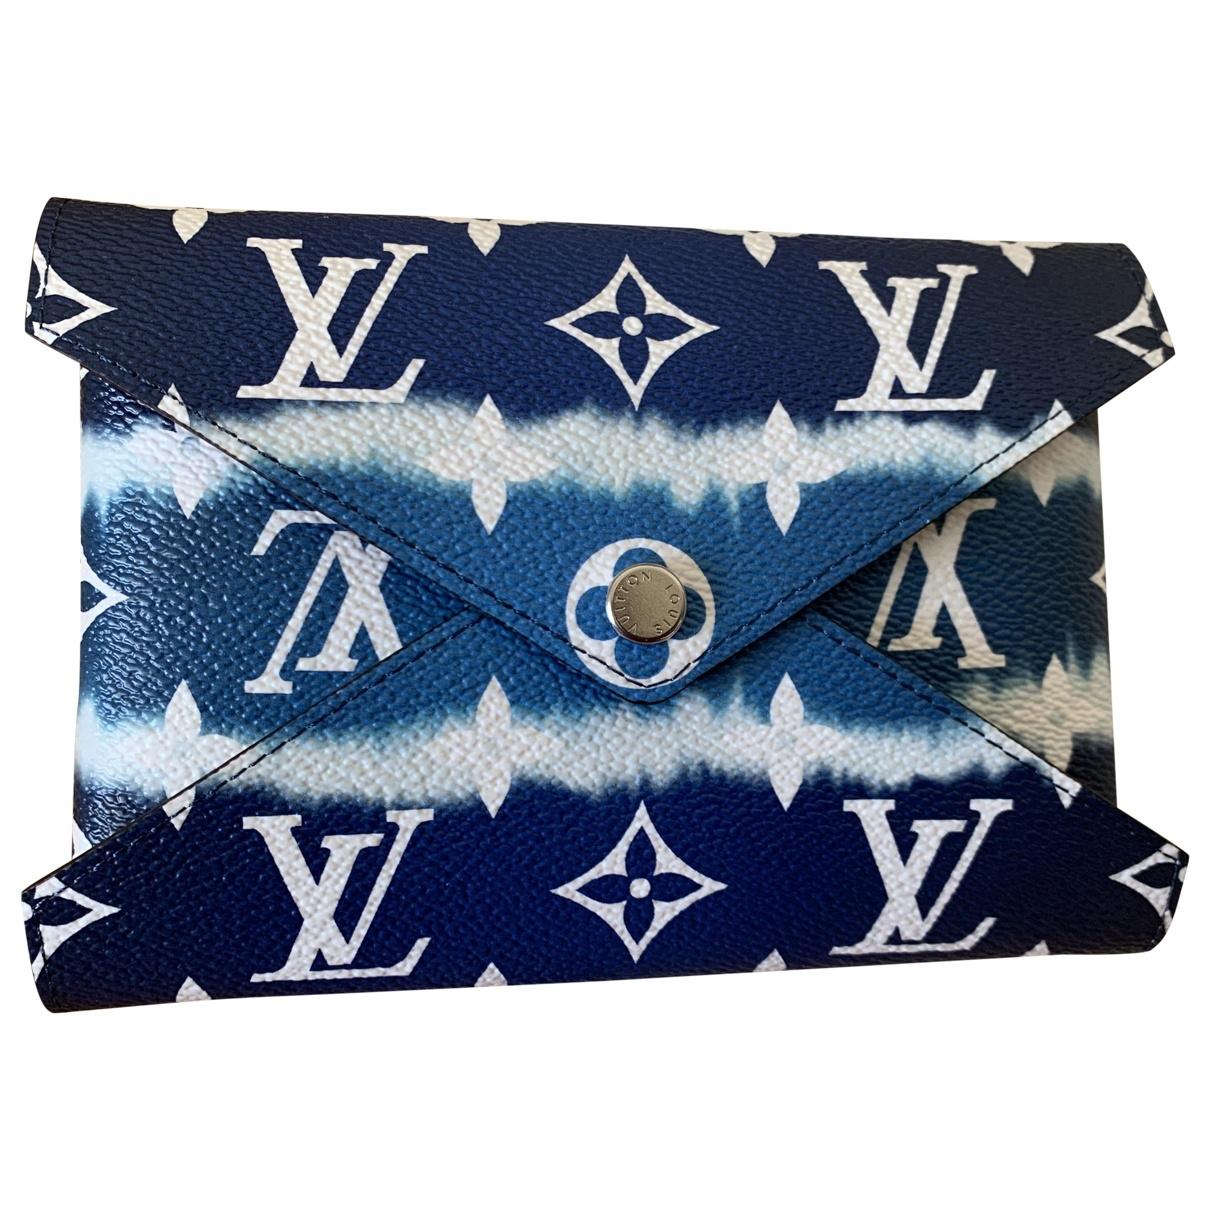 Louis Vuitton - Pochette Kirigami pour femme en toile - bleu